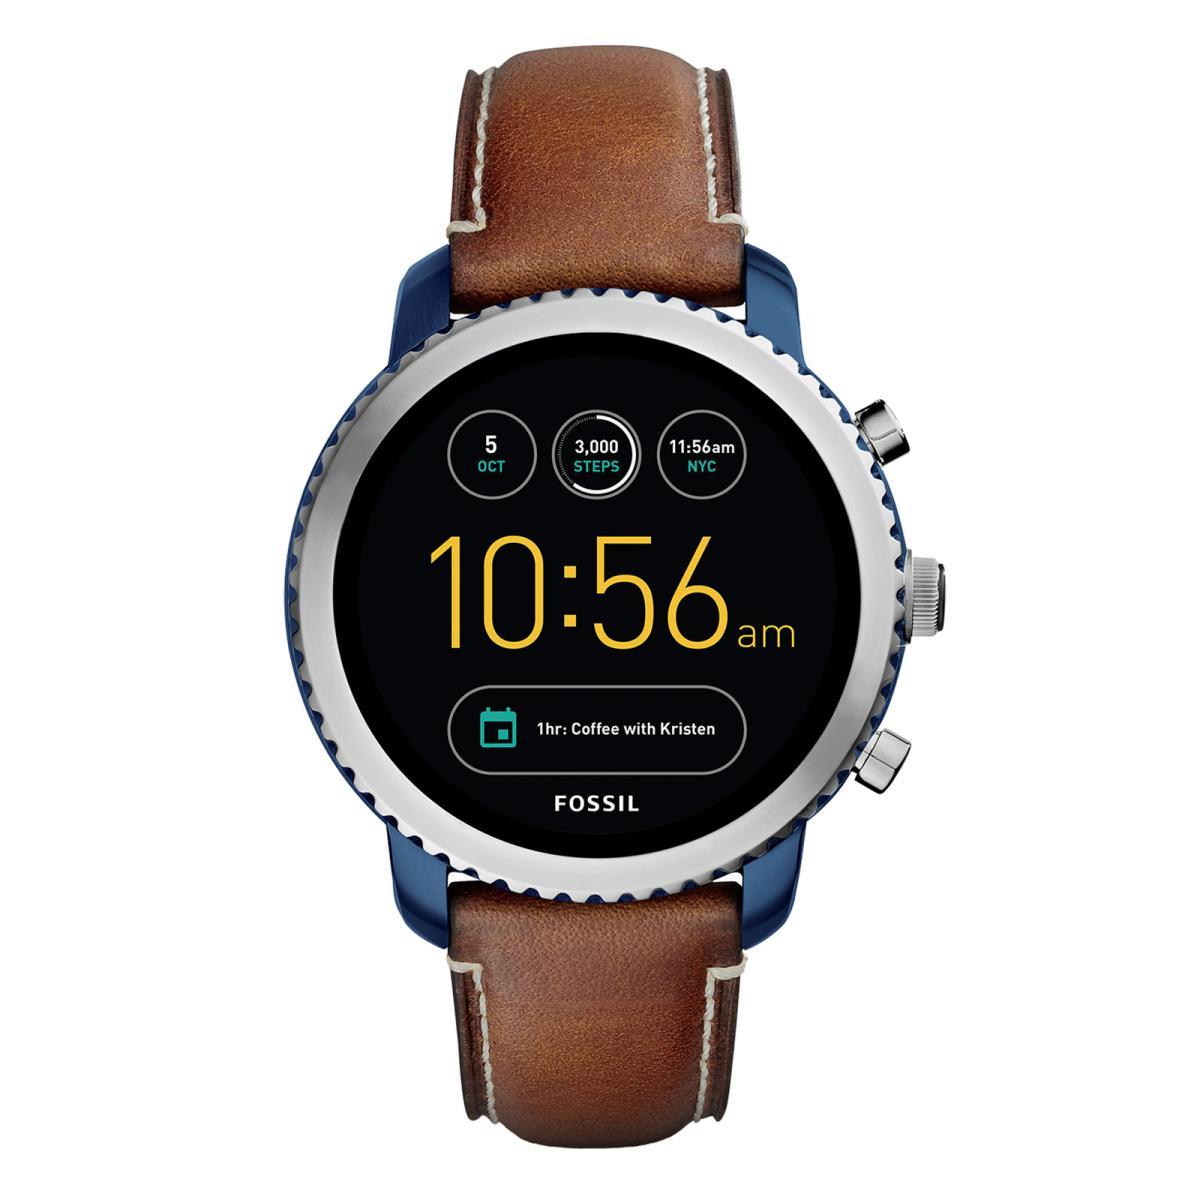 a4104397838b Reloj Fossil - FTW4004 - Hombre - Time Square